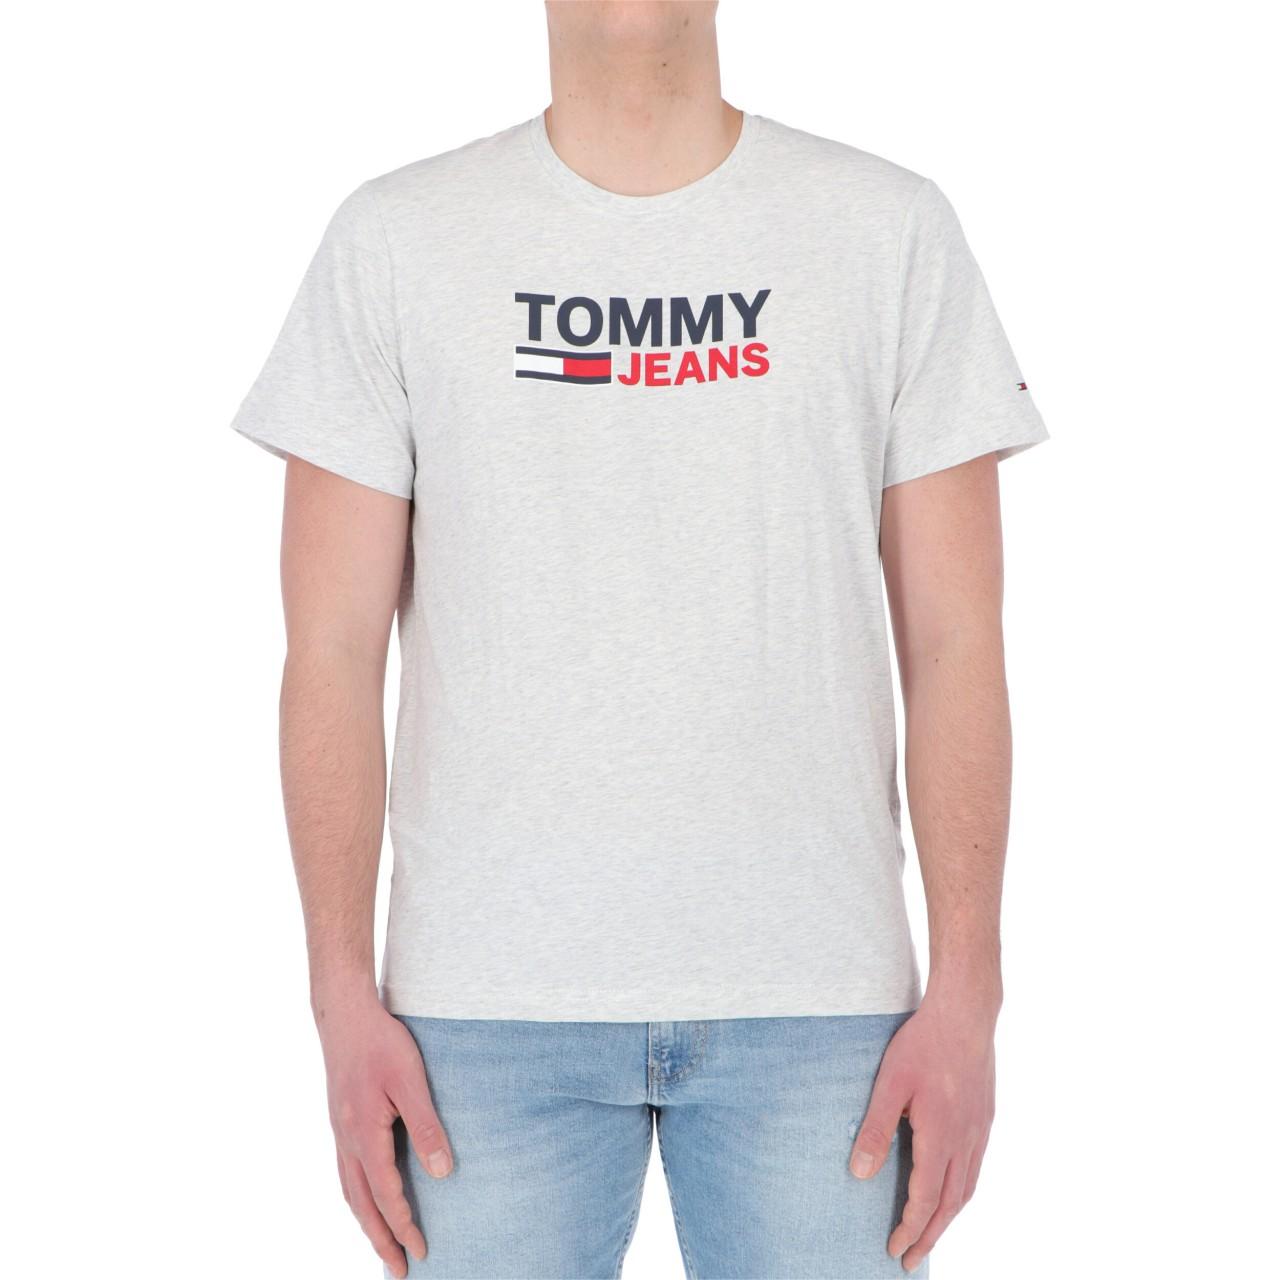 Tommy hilfiger Uomo Tshirt Tommy Hilfiger Jeans Uomo Crop Logo Tee 10214P